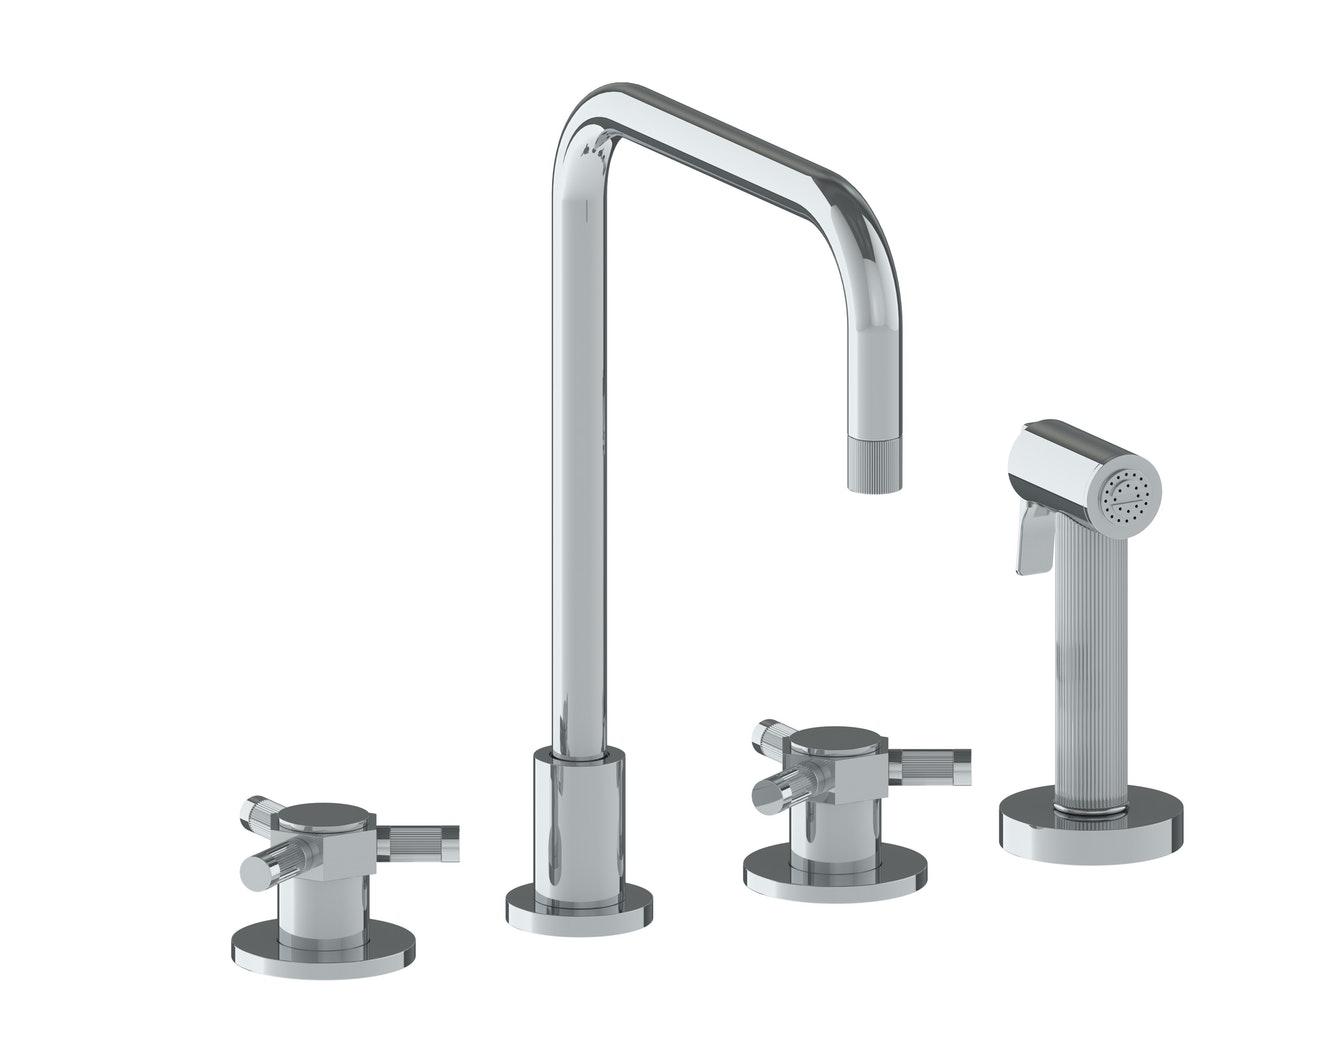 Watermark 111-7.1-SP5 Kitchen Fixtures 4-Hole Kitchen Faucet